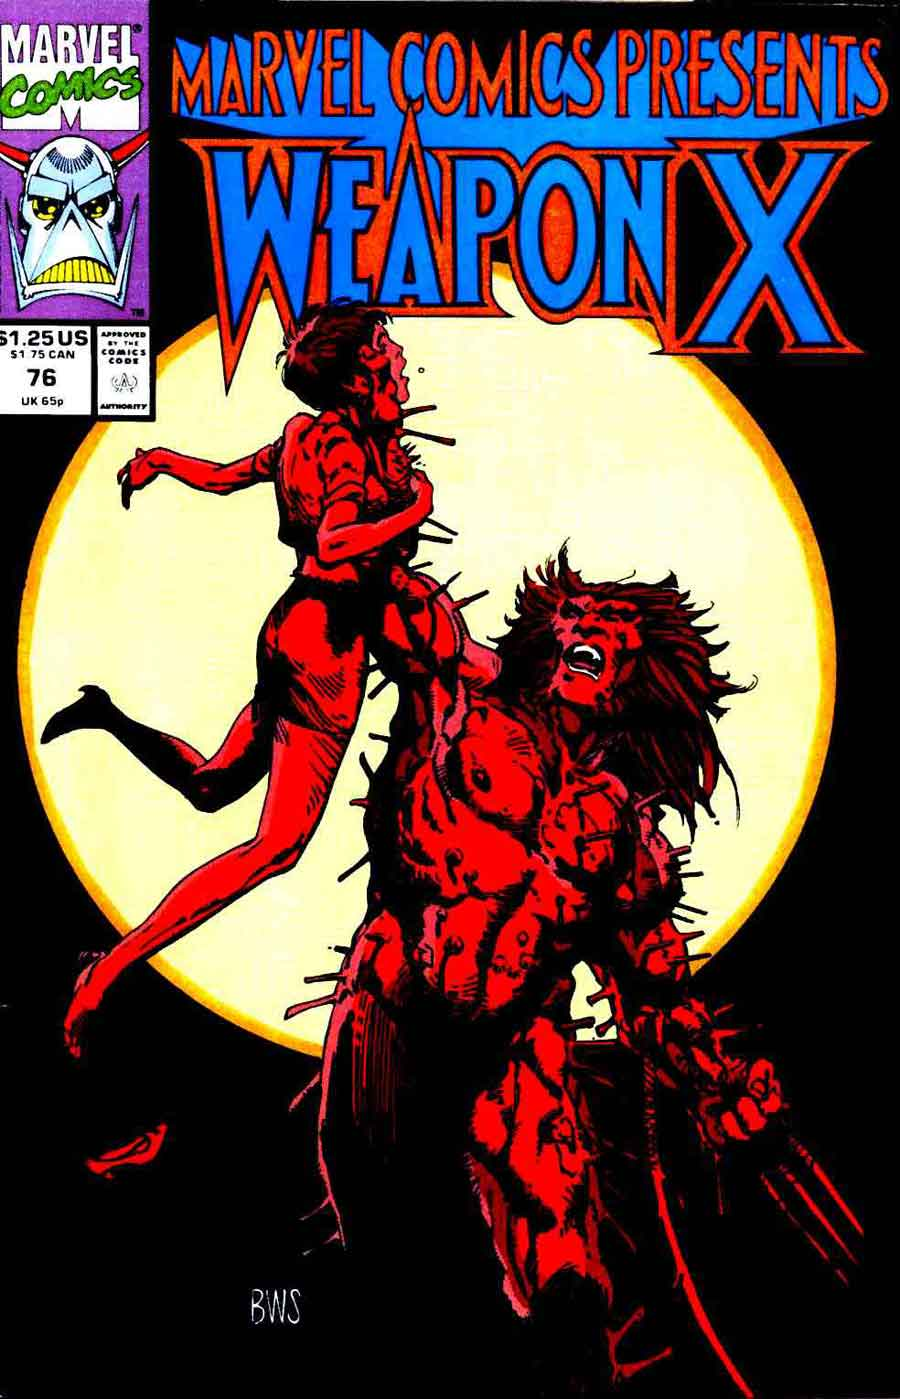 Marvel Comics Presents: Weapon X #78 CGC 9.8 1991 Wolverine origin Barry Windsor